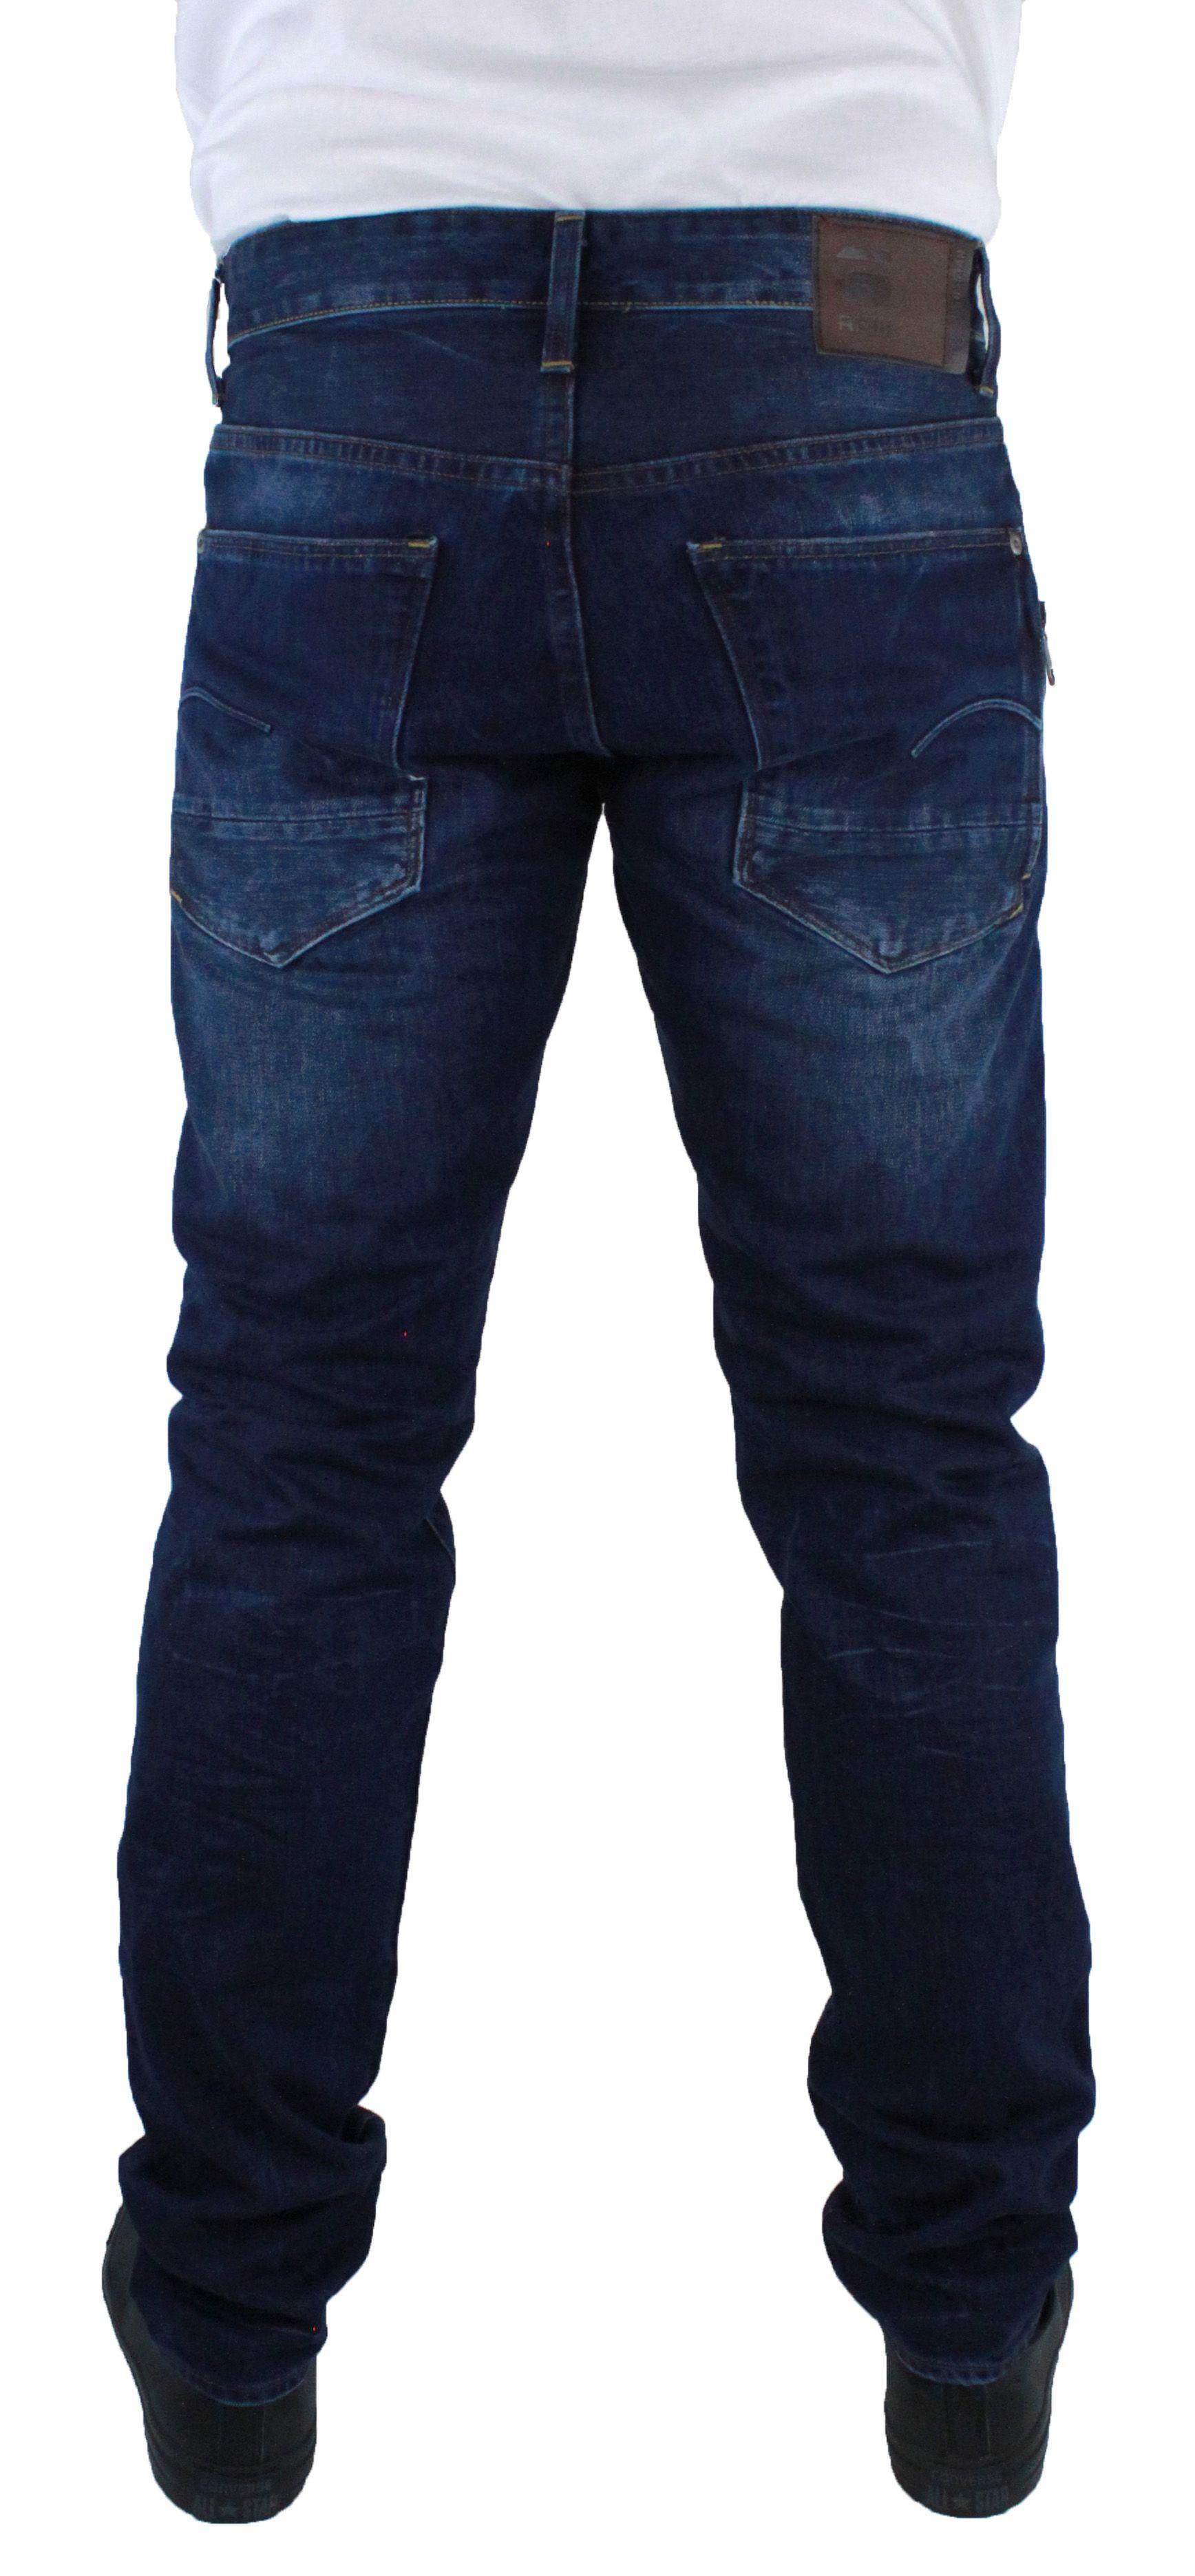 G-Star Stean Tapered DK Aged Wisk Denim Jeans